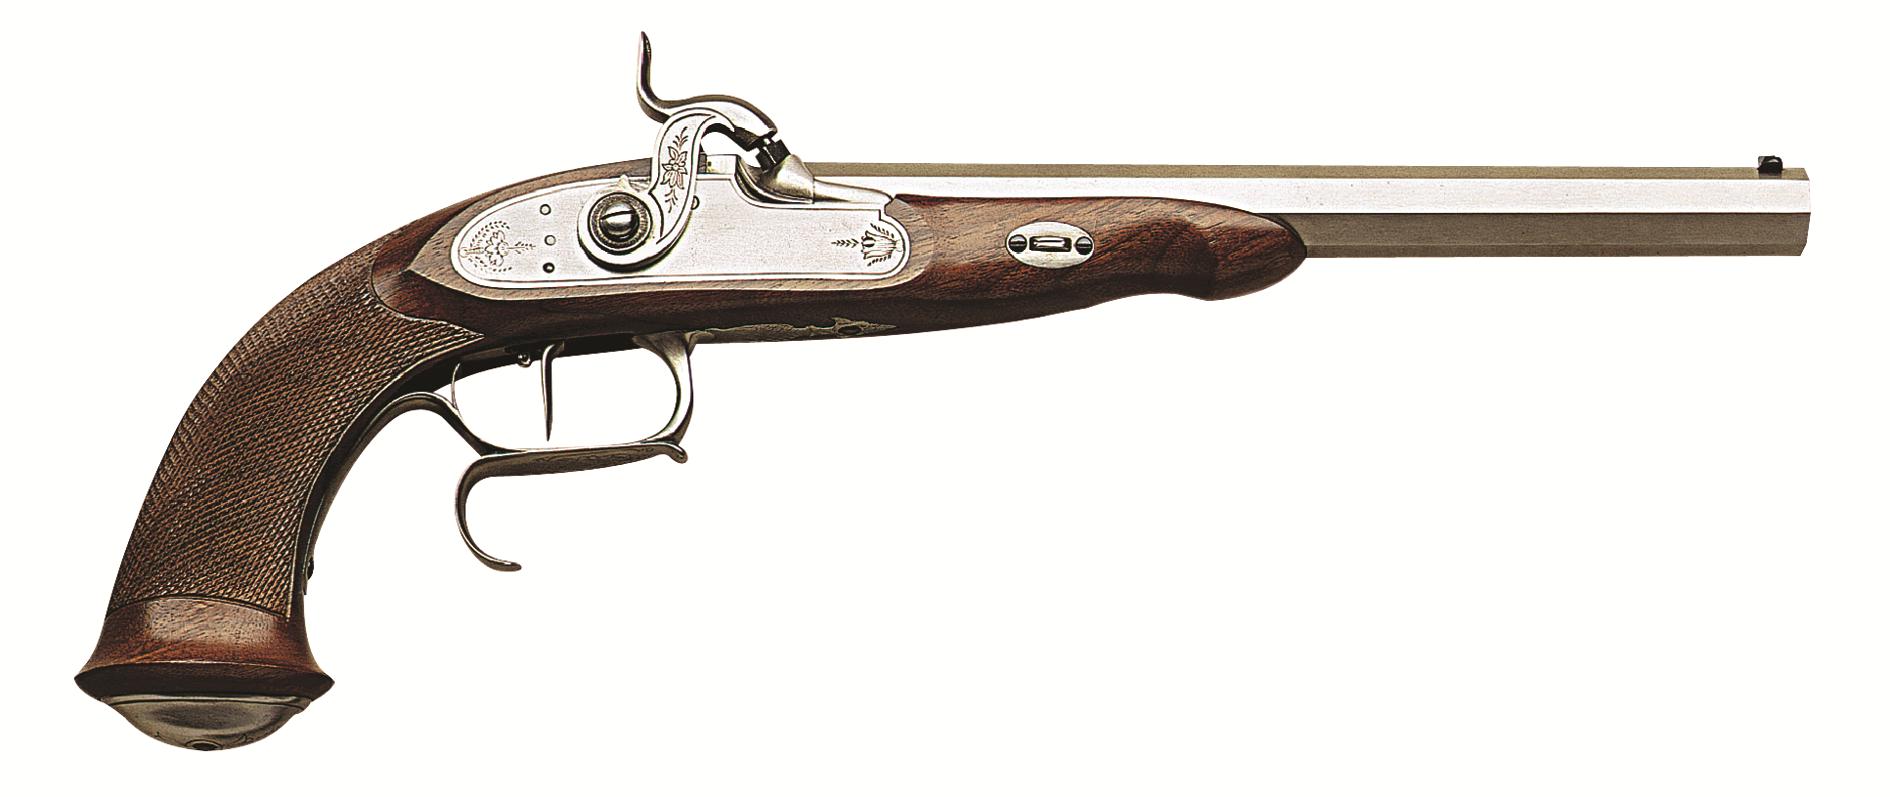 Perkusní pistole Le Page Target